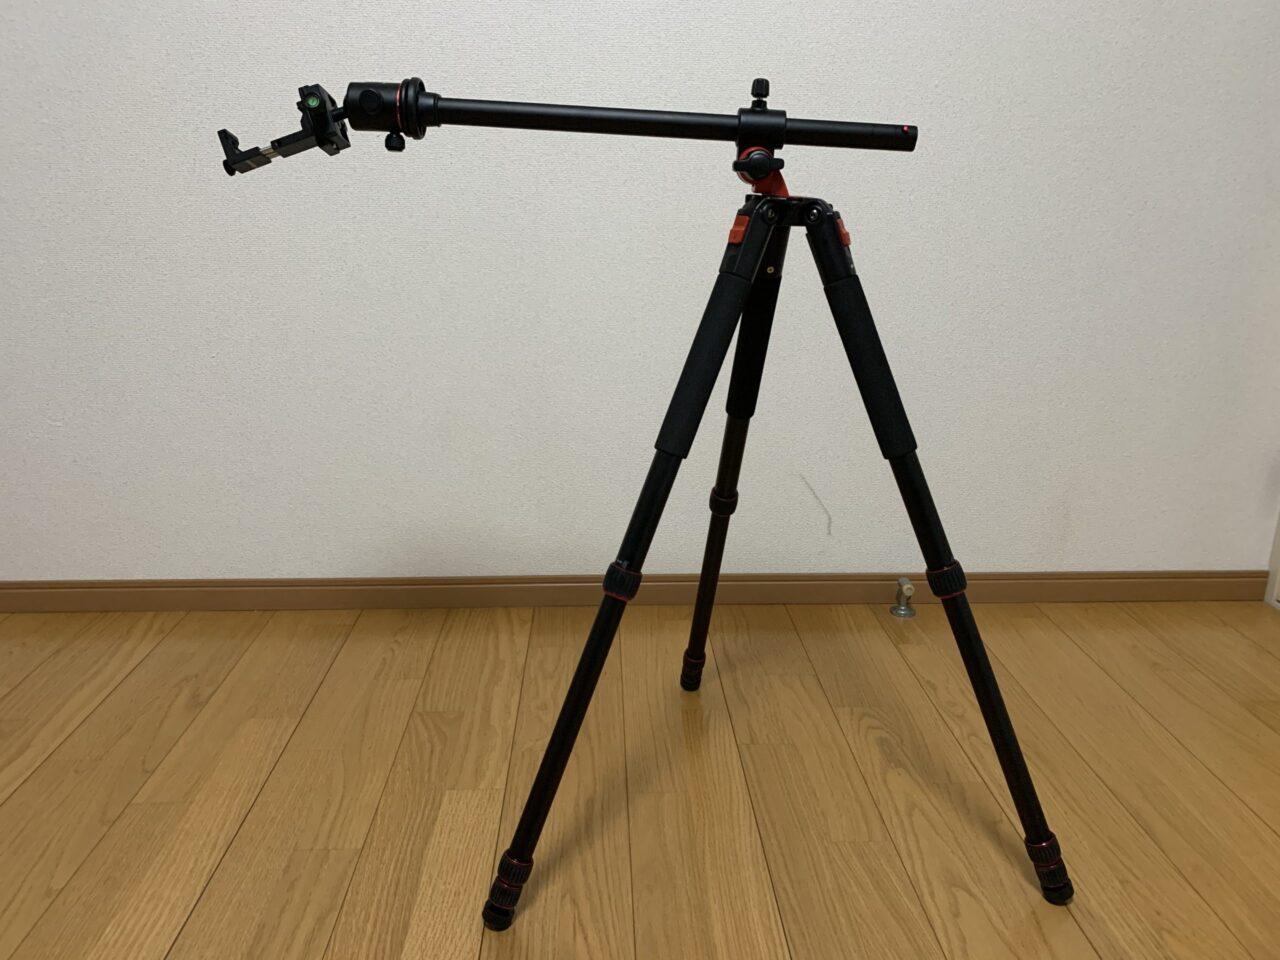 Neewerカメラ三脚を使ってスマホで俯瞰撮影してみた